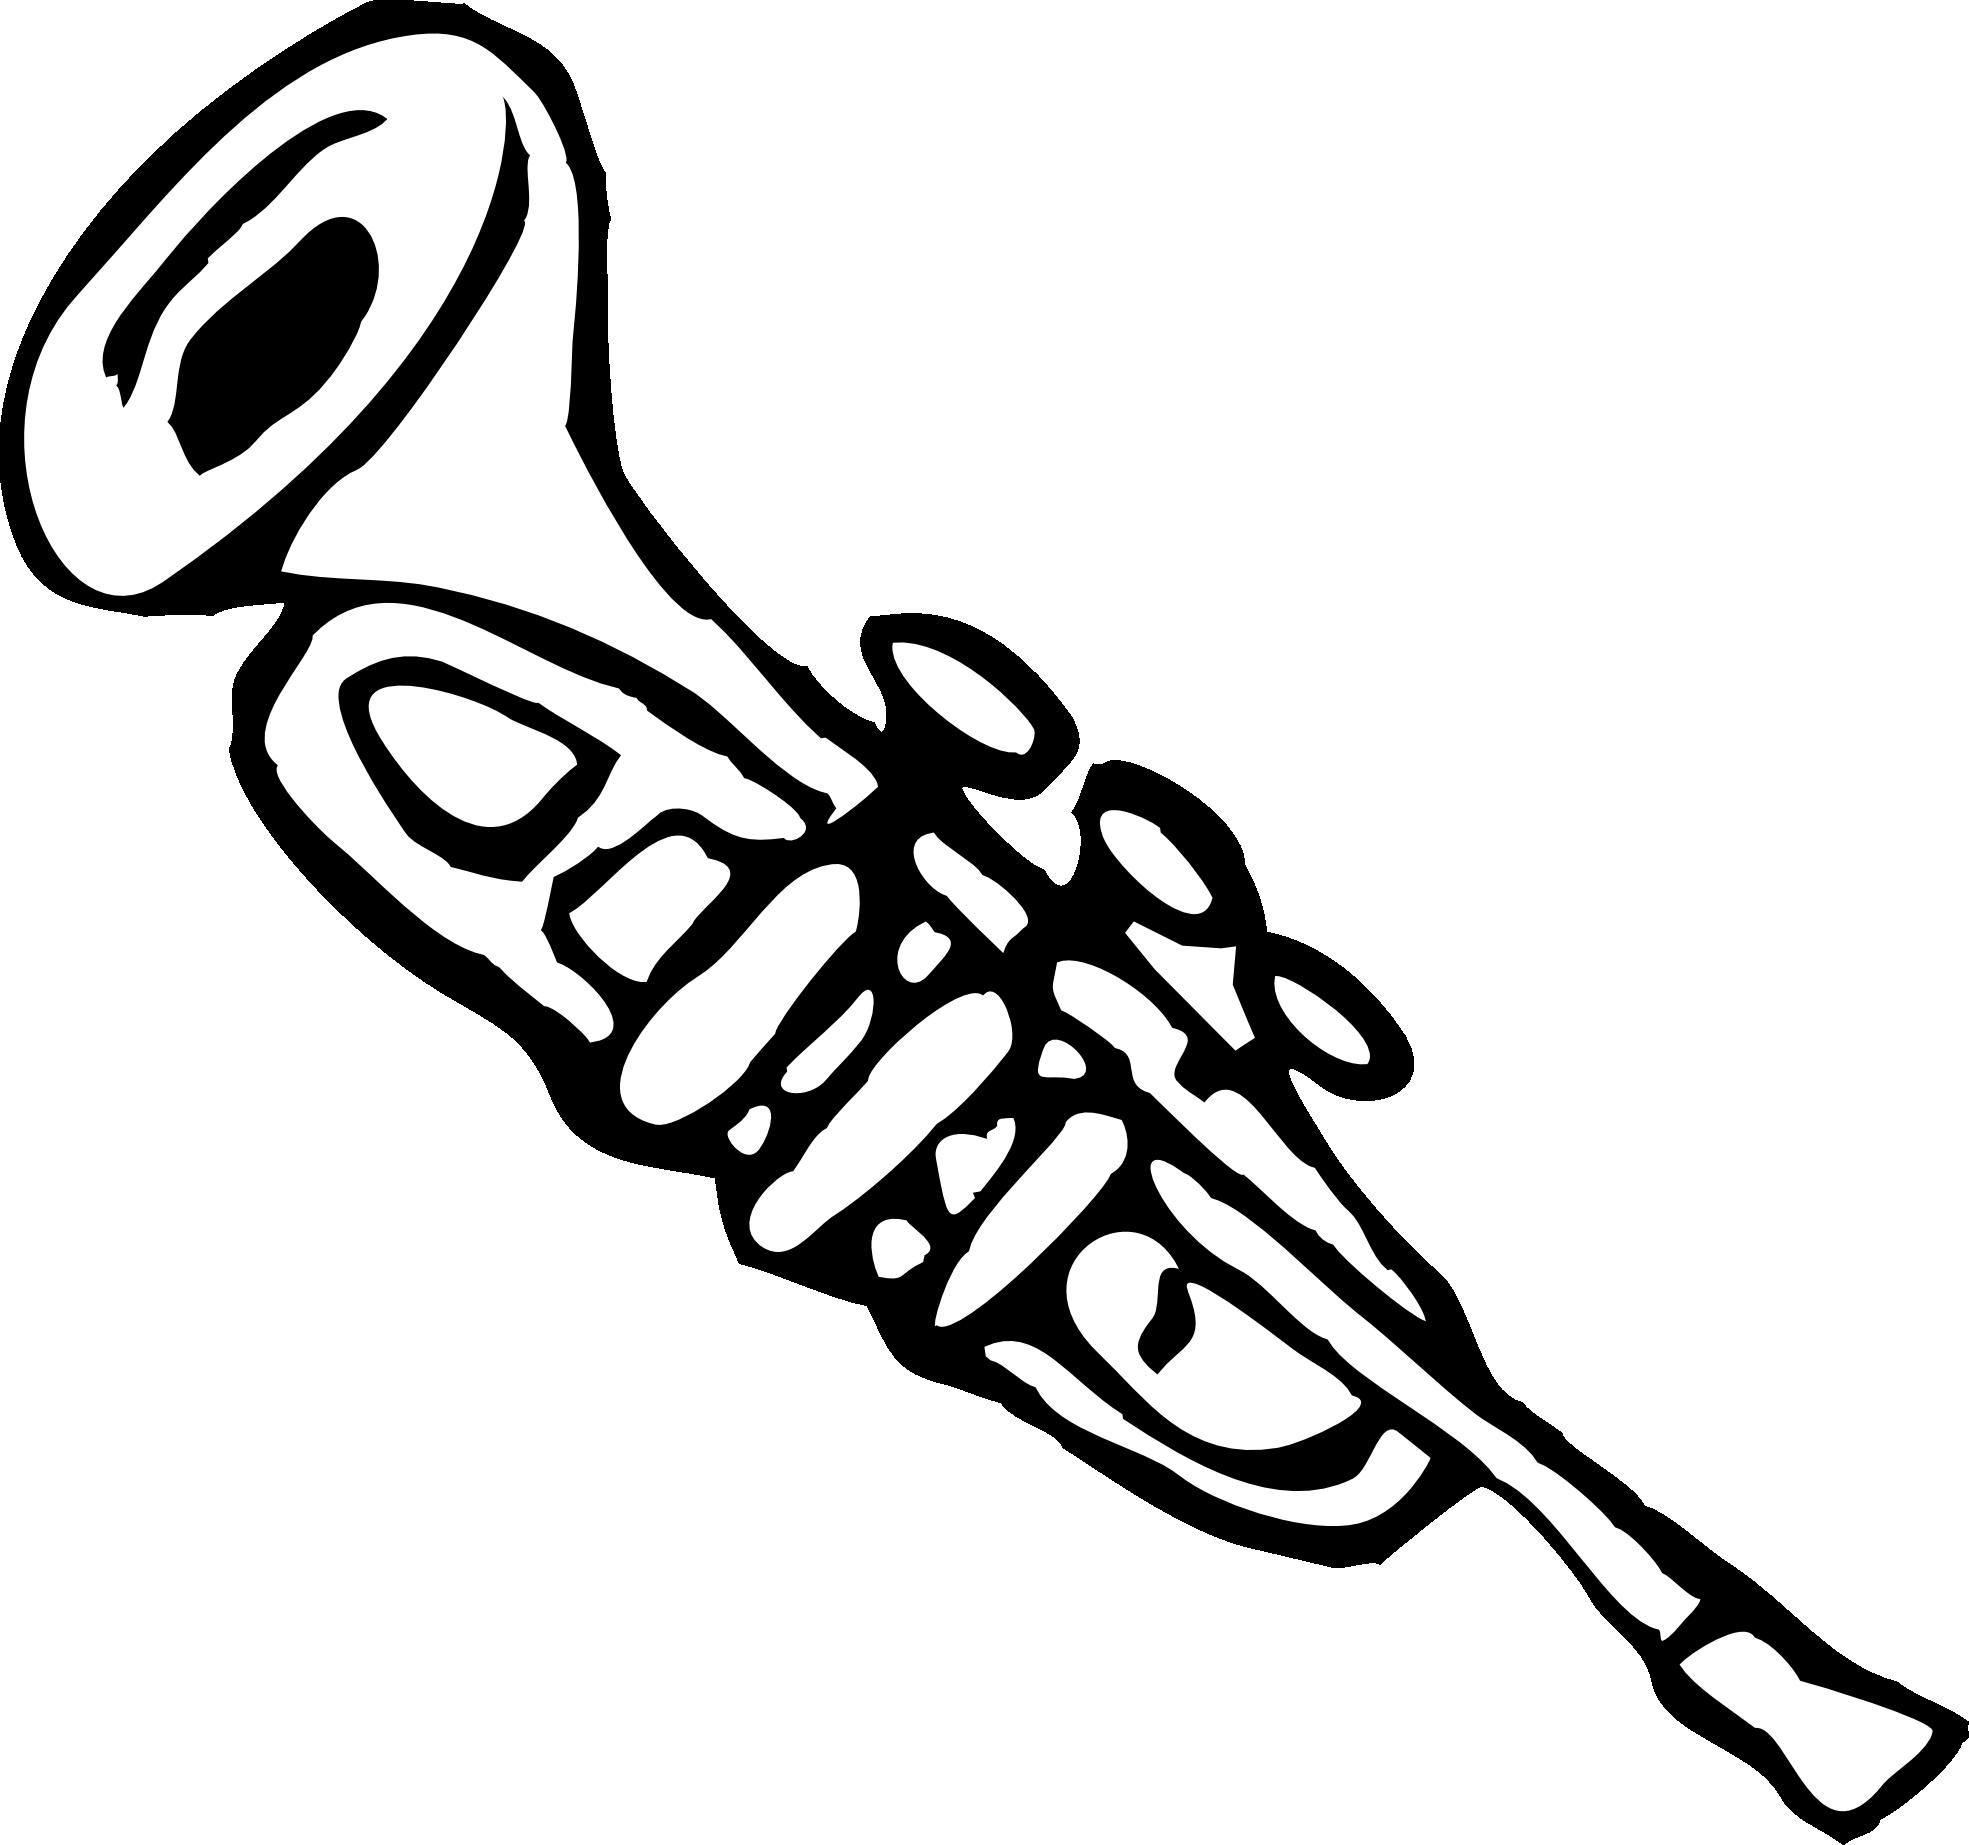 Trumpet Clip Art Trumpet 3 Black White L-Trumpet Clip Art Trumpet 3 Black White Line Art Christmas Xmas Music-13